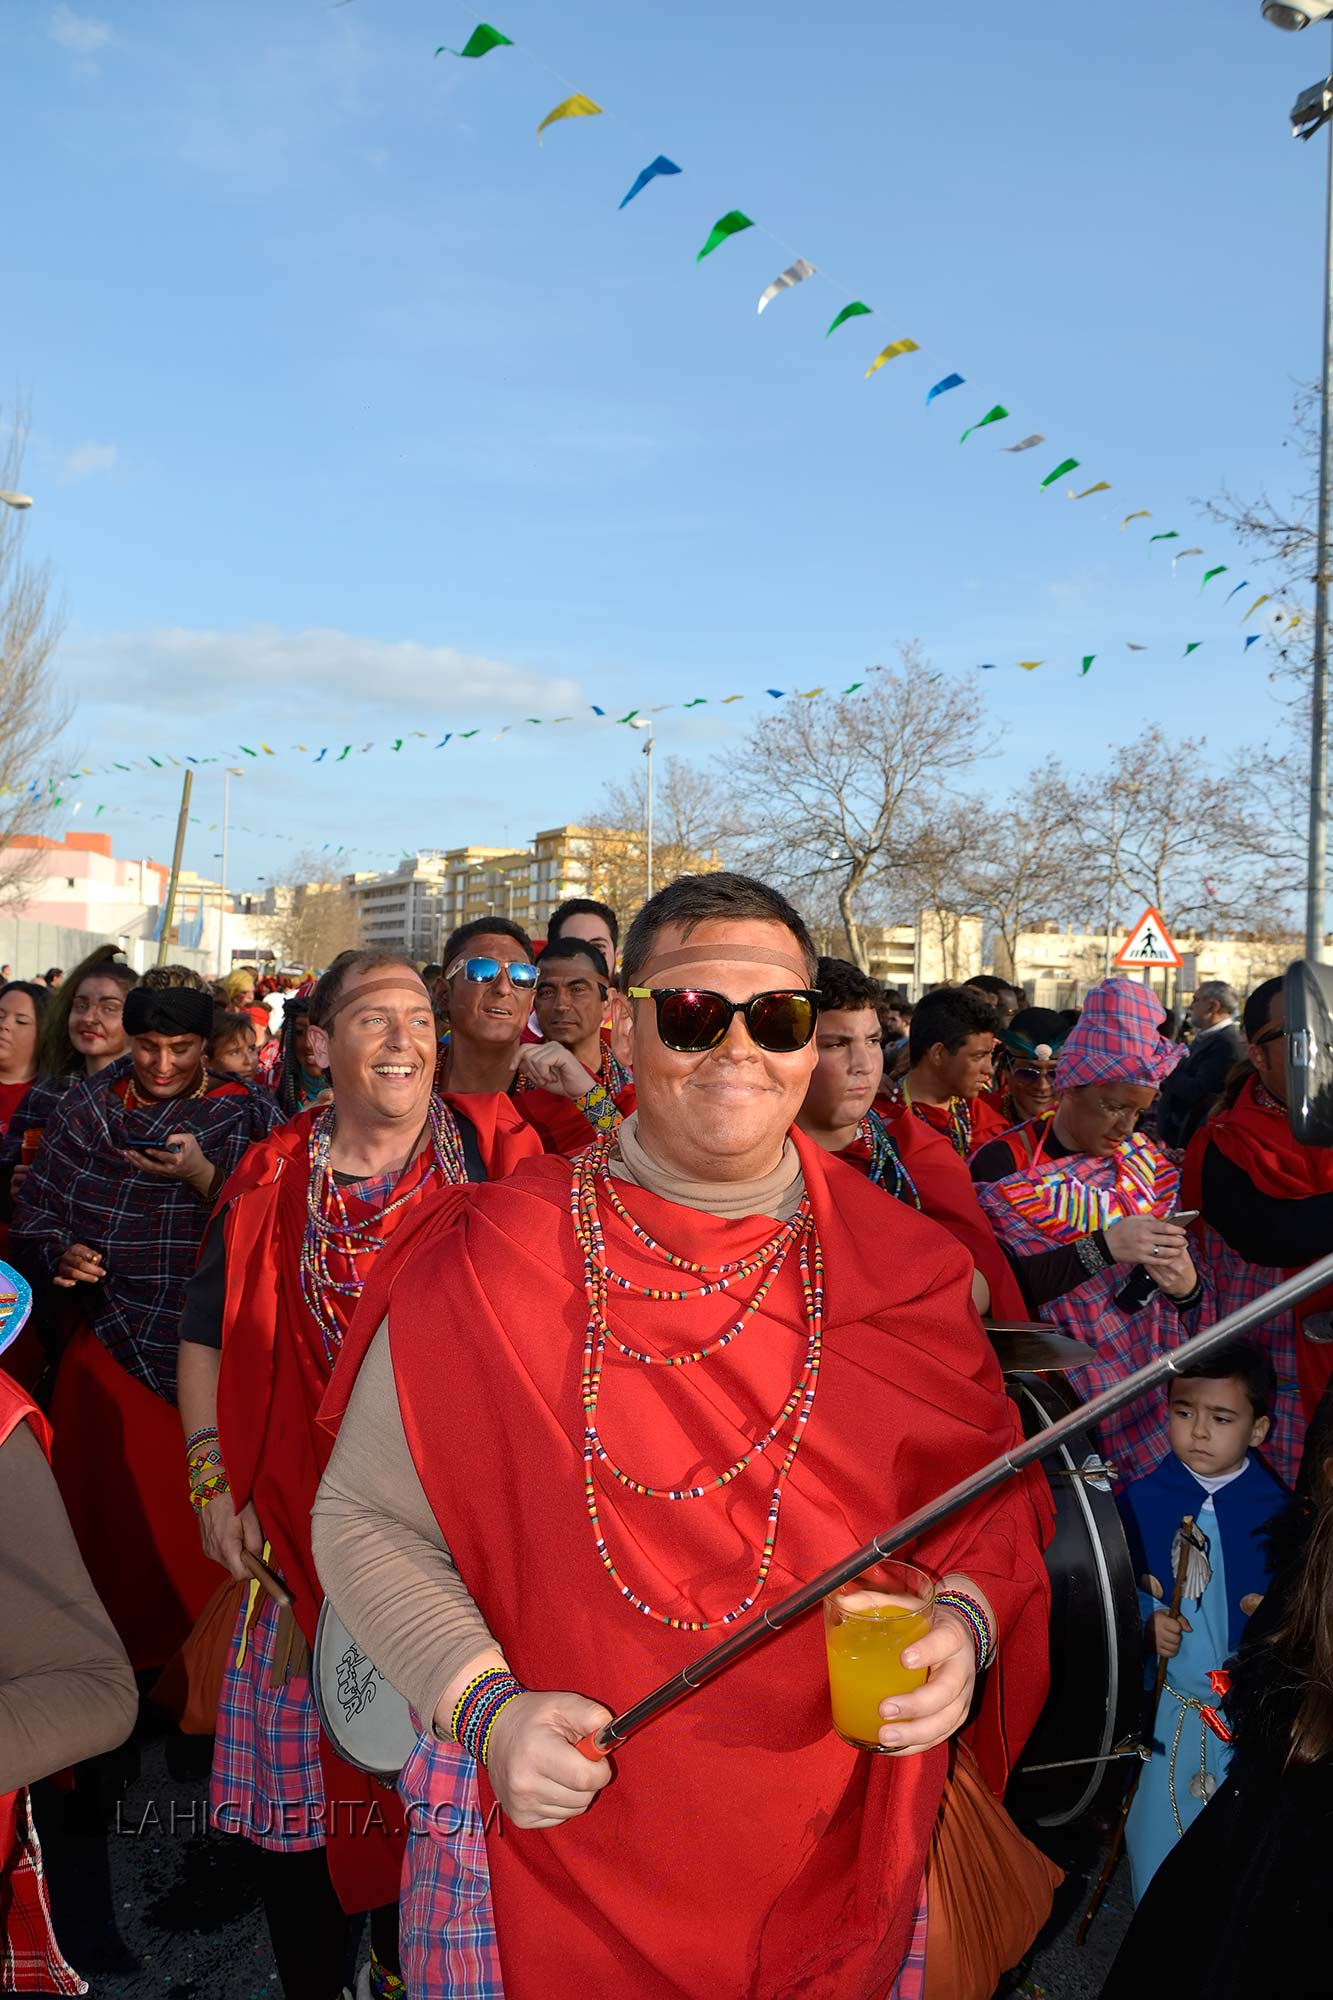 cabalgata carnaval isla cristina _DSC0702